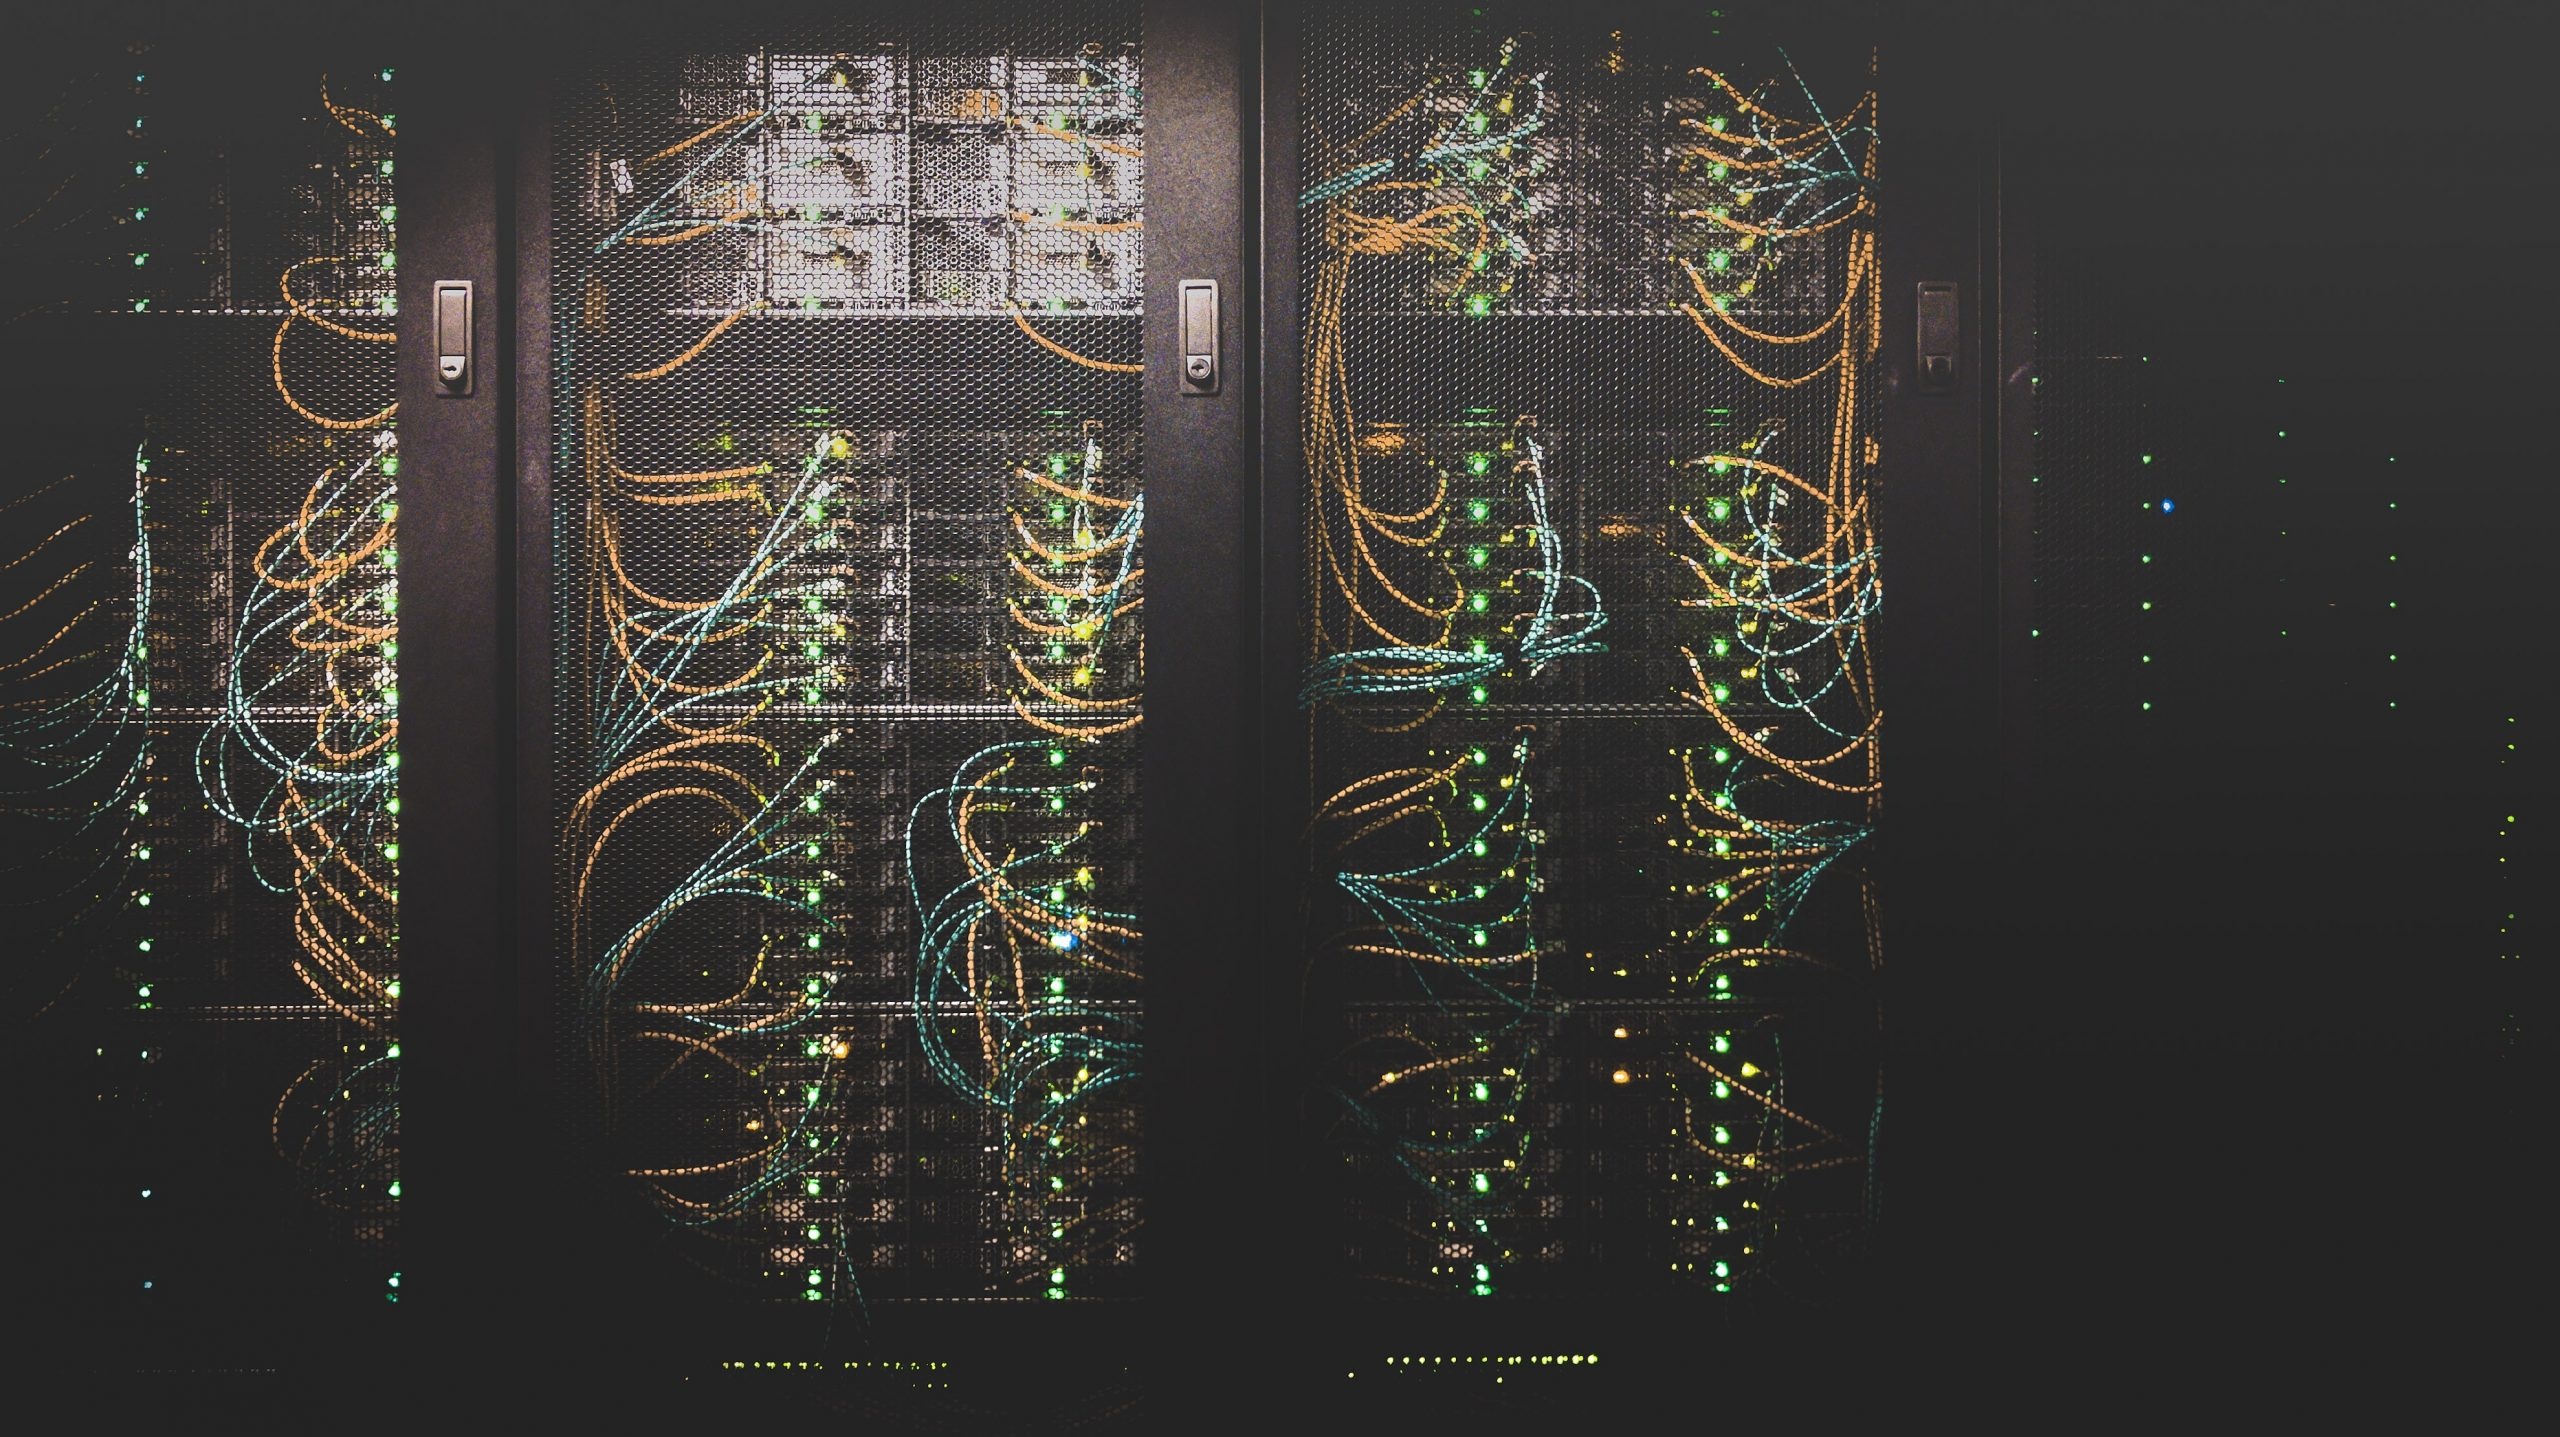 202021.2 Data center Upgrade